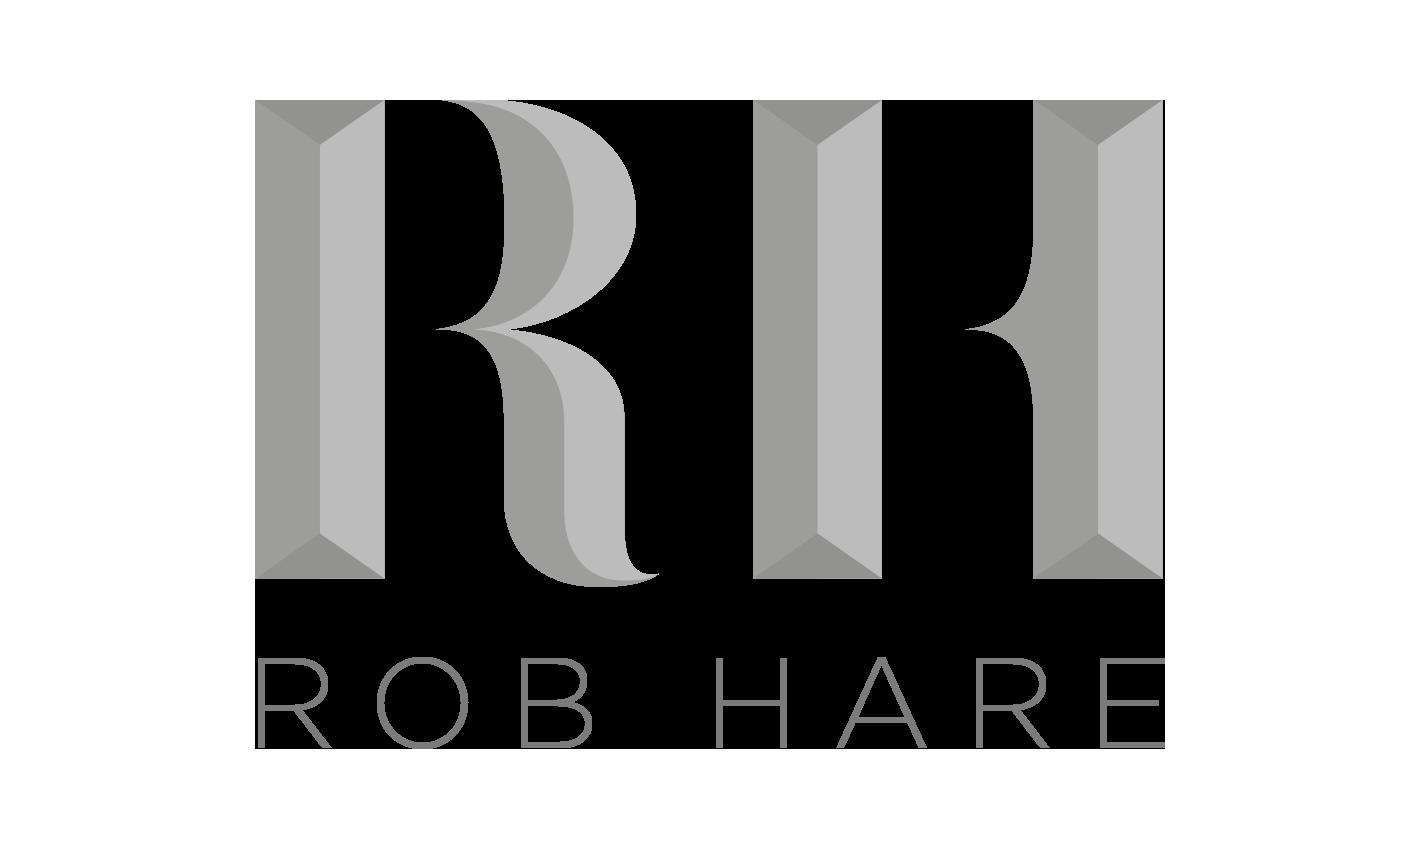 Rob Hare